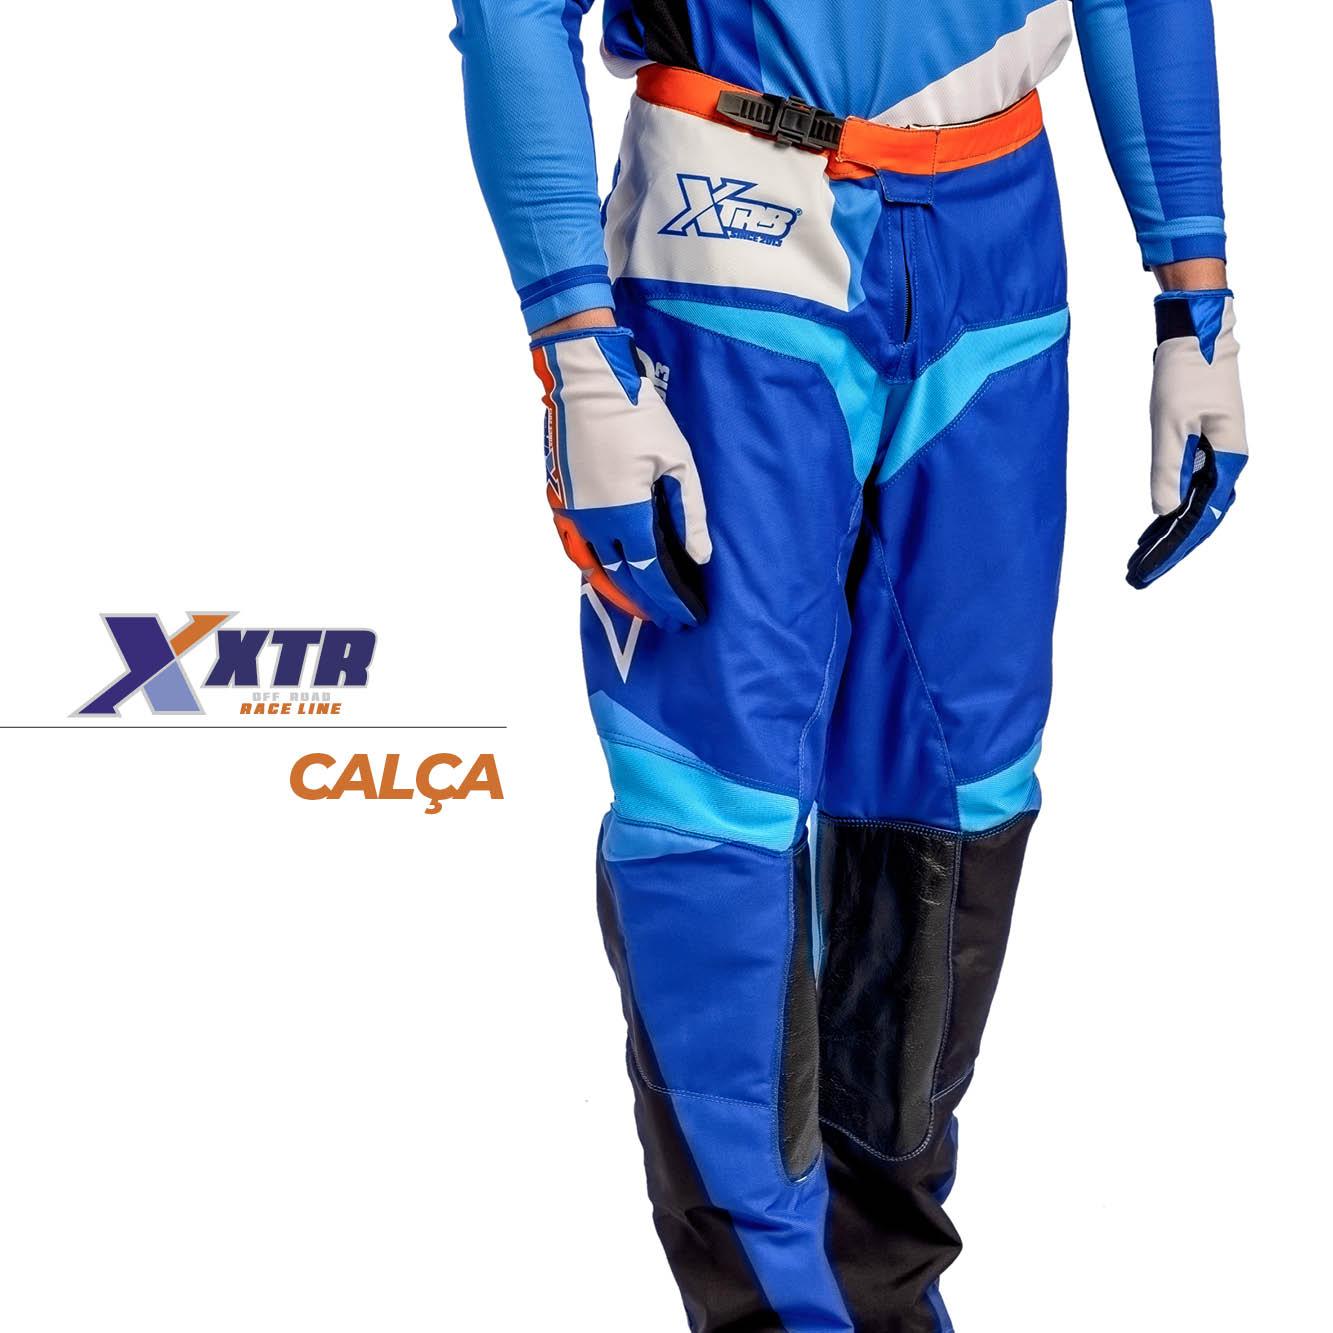 Calças XTRB - XTR Azul